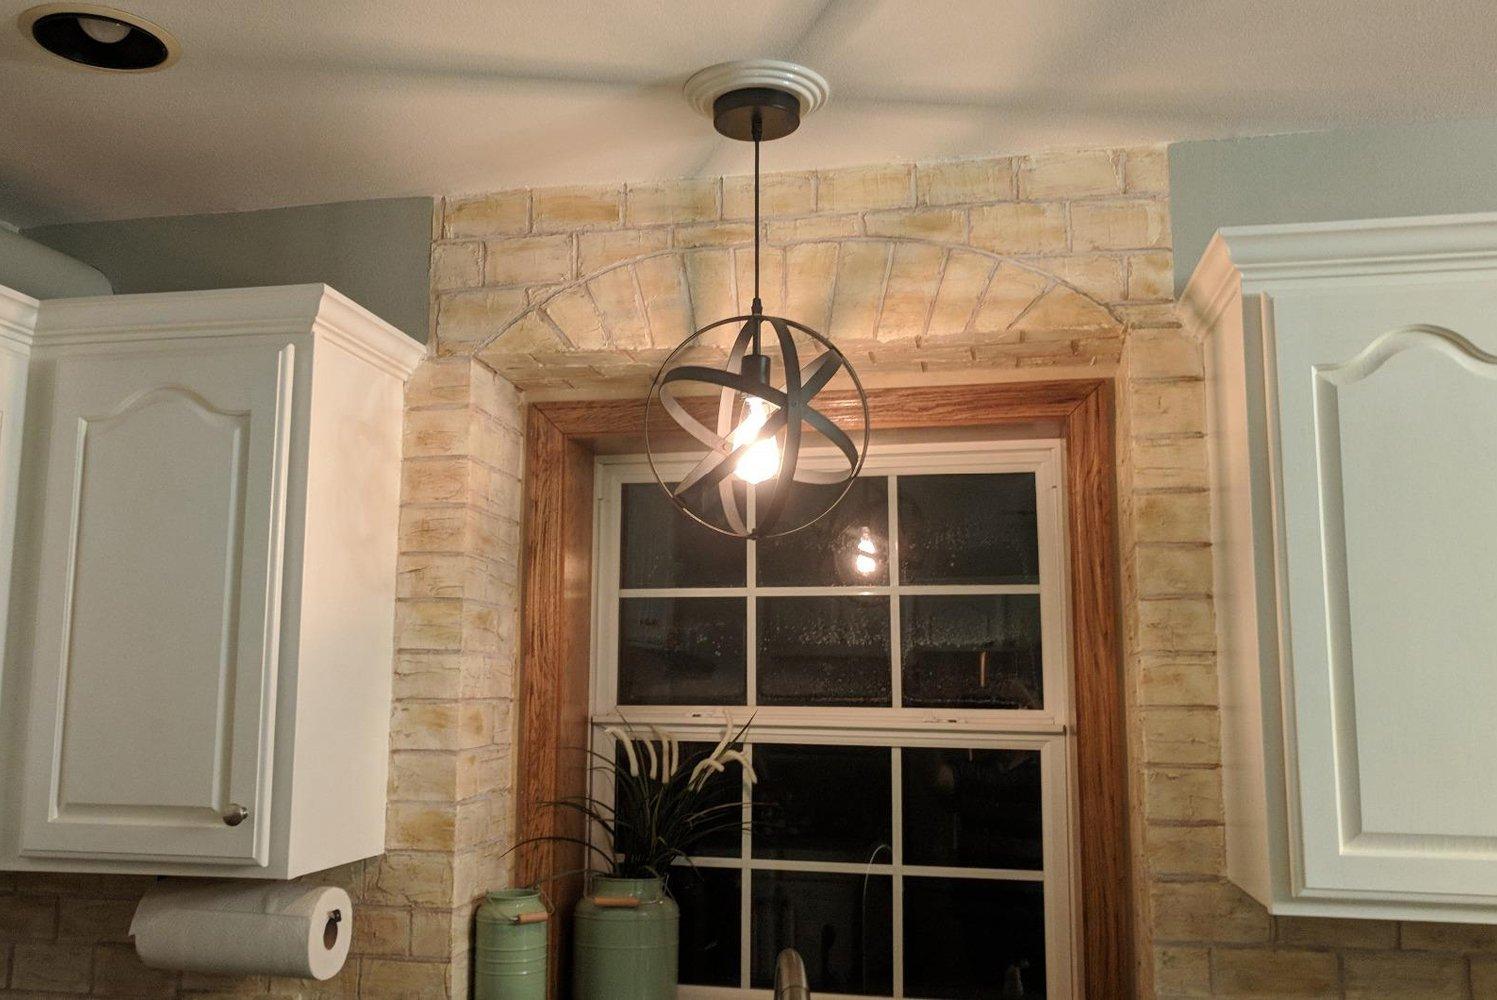 Lampada Vintage Industriale : Lampadario vintage koonting industriale lampada a sospensione